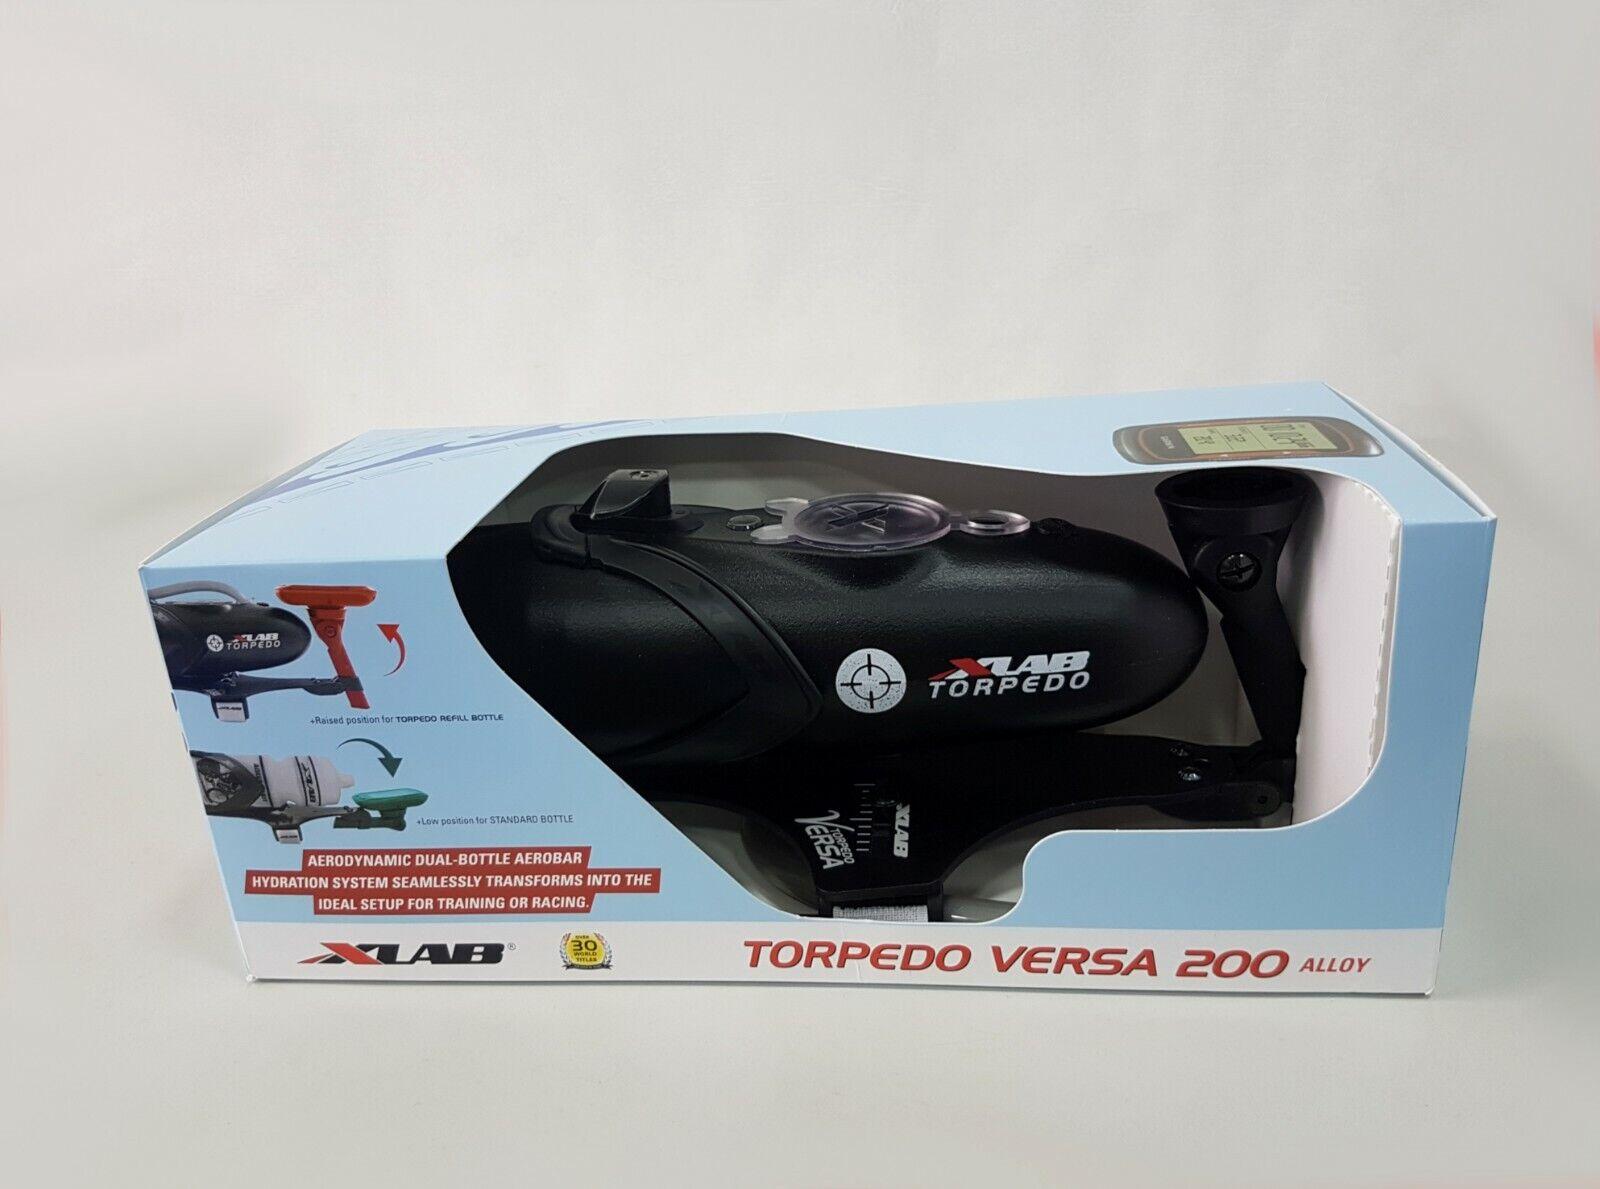 Conjunto De Botella XLab areobar Torpedo Versa 200 Negro (Mount + Jaula + Botella)